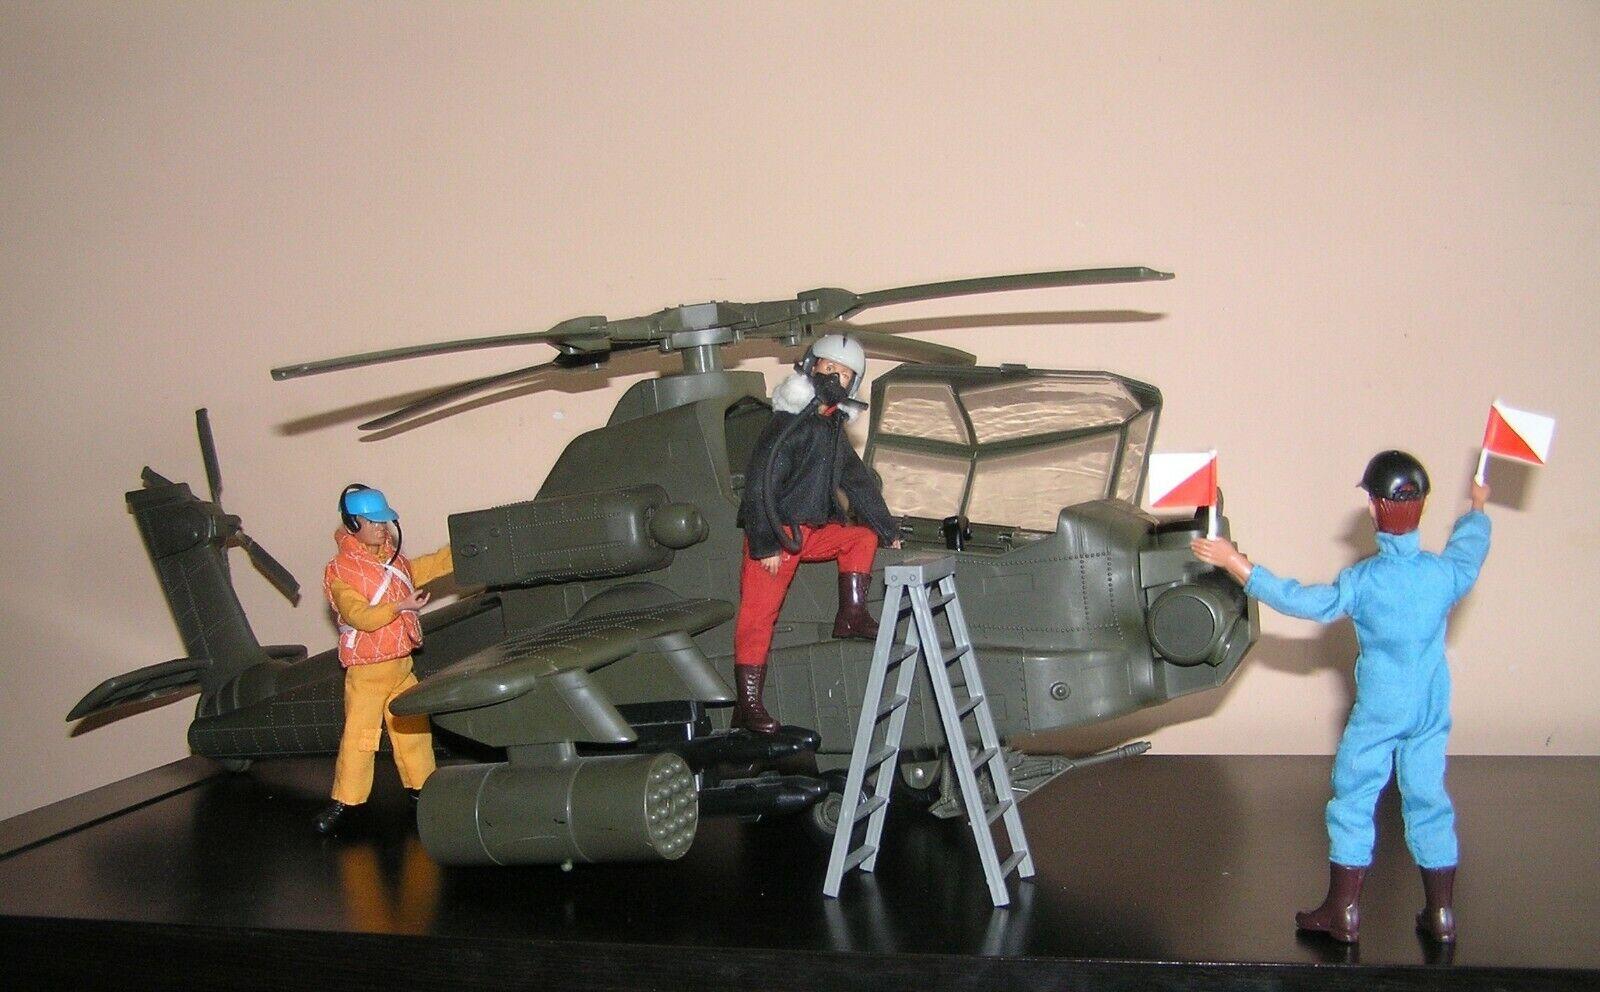 Madelman mde. Helicoptero militar de combate. Ejército del Aire